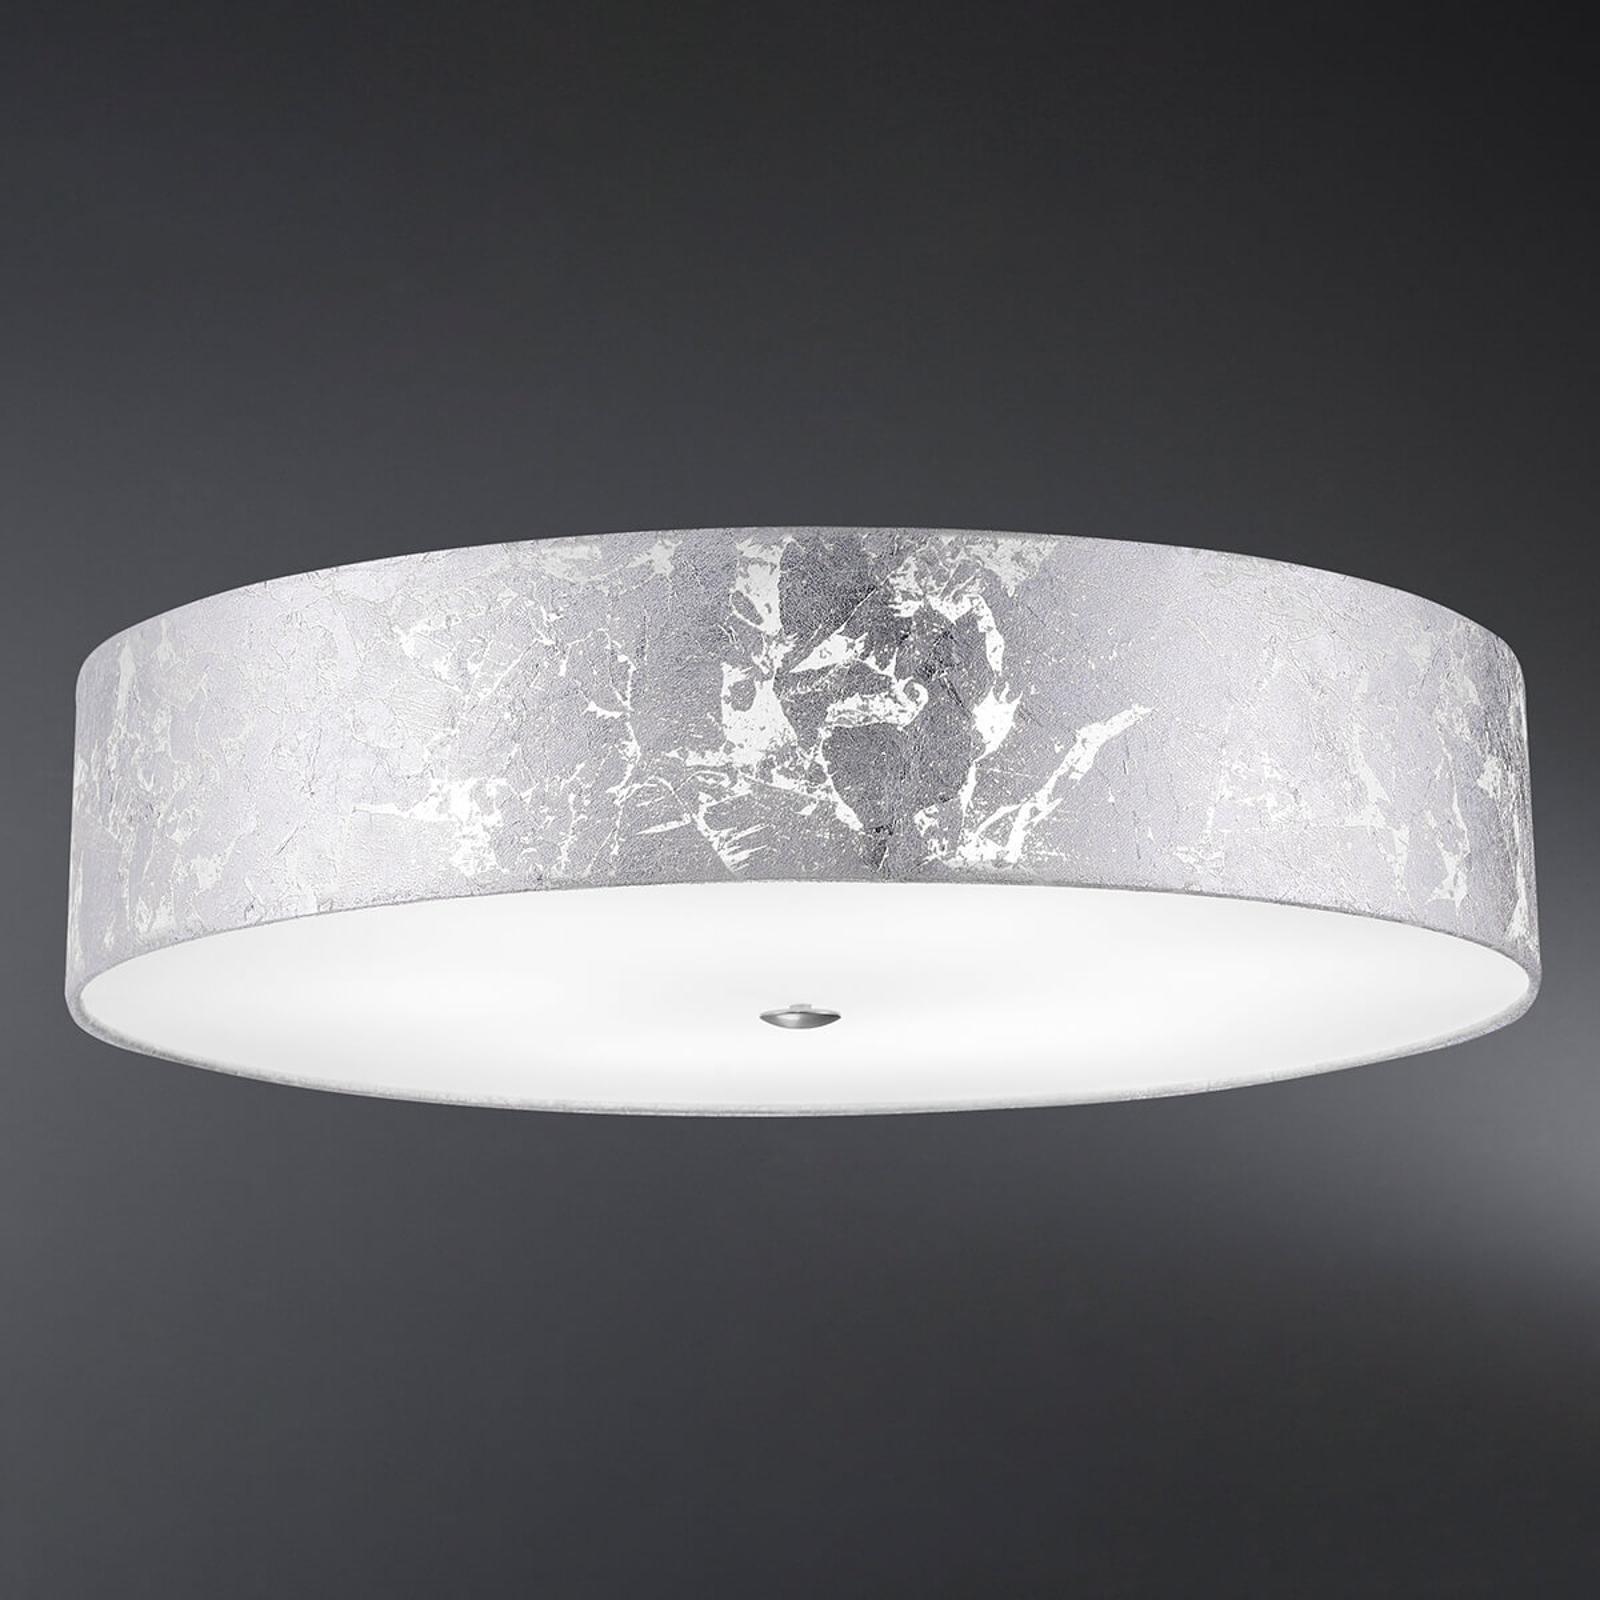 Loop - plafondlamp met bladzilver-kap